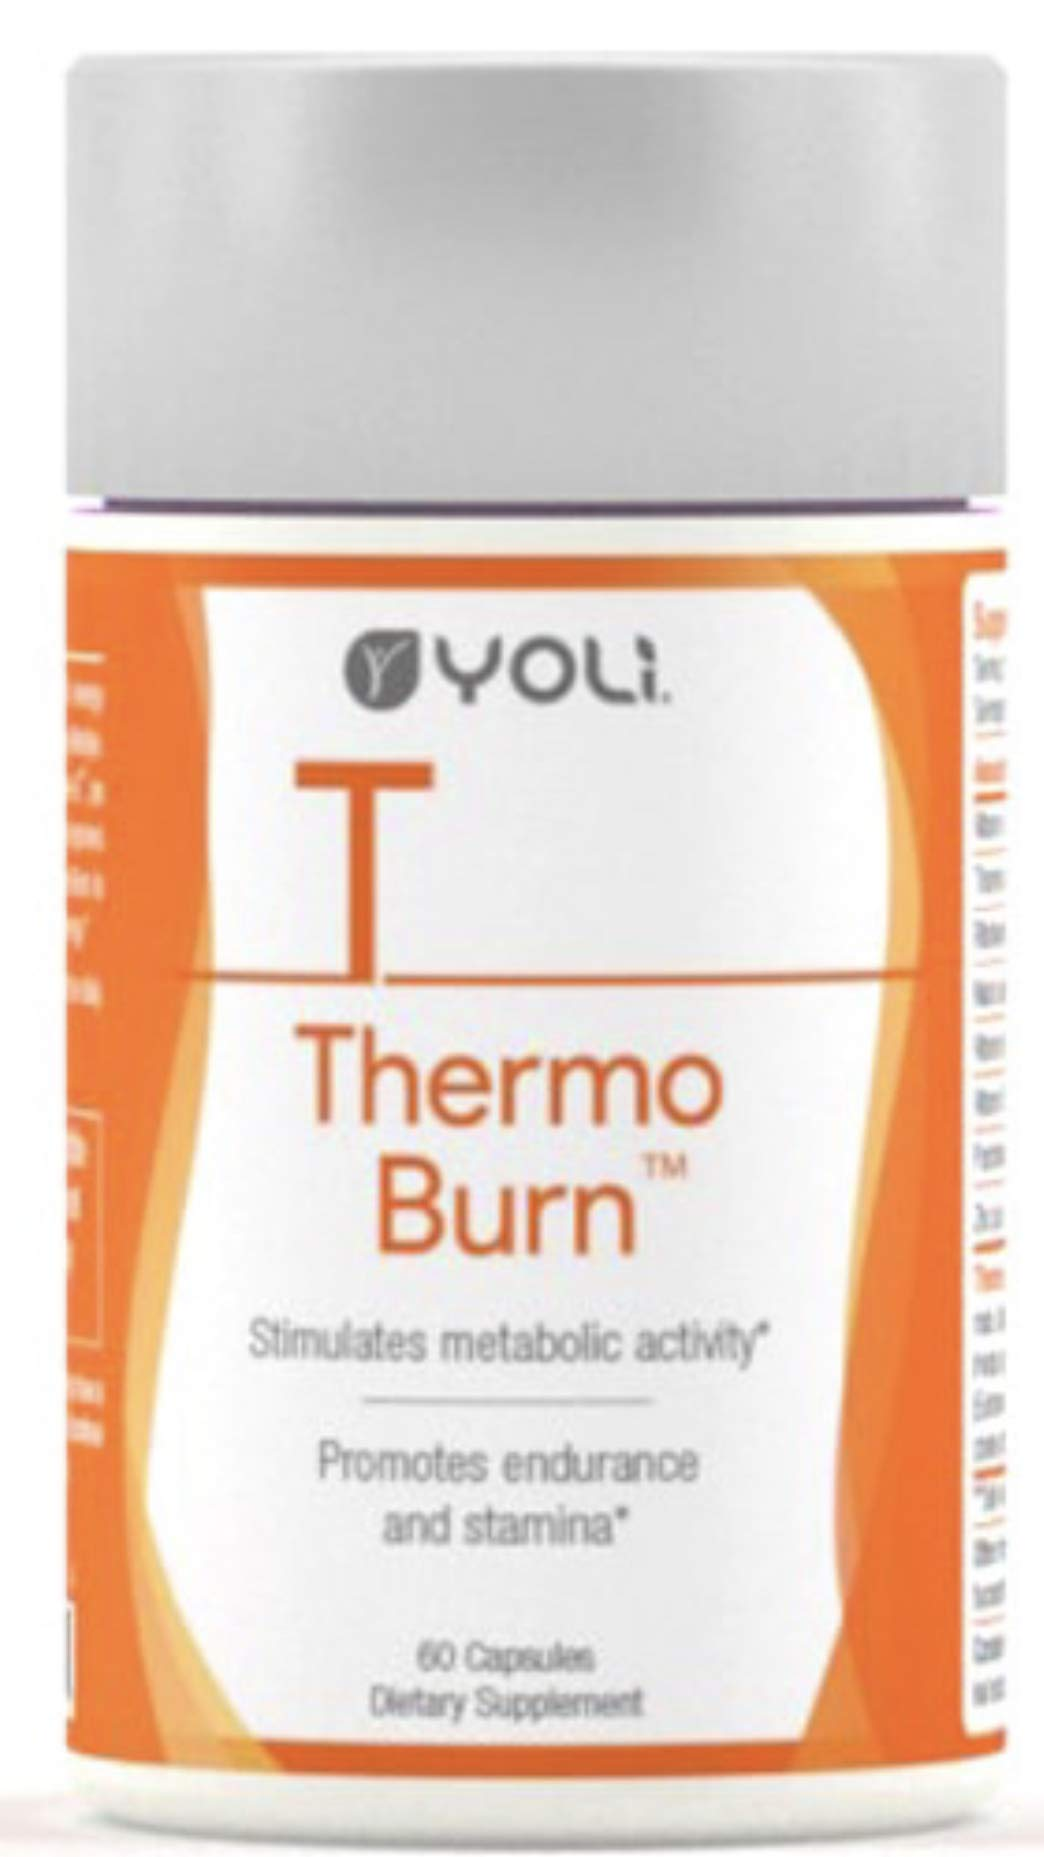 Yoli THERMO BURN Energy Capsules